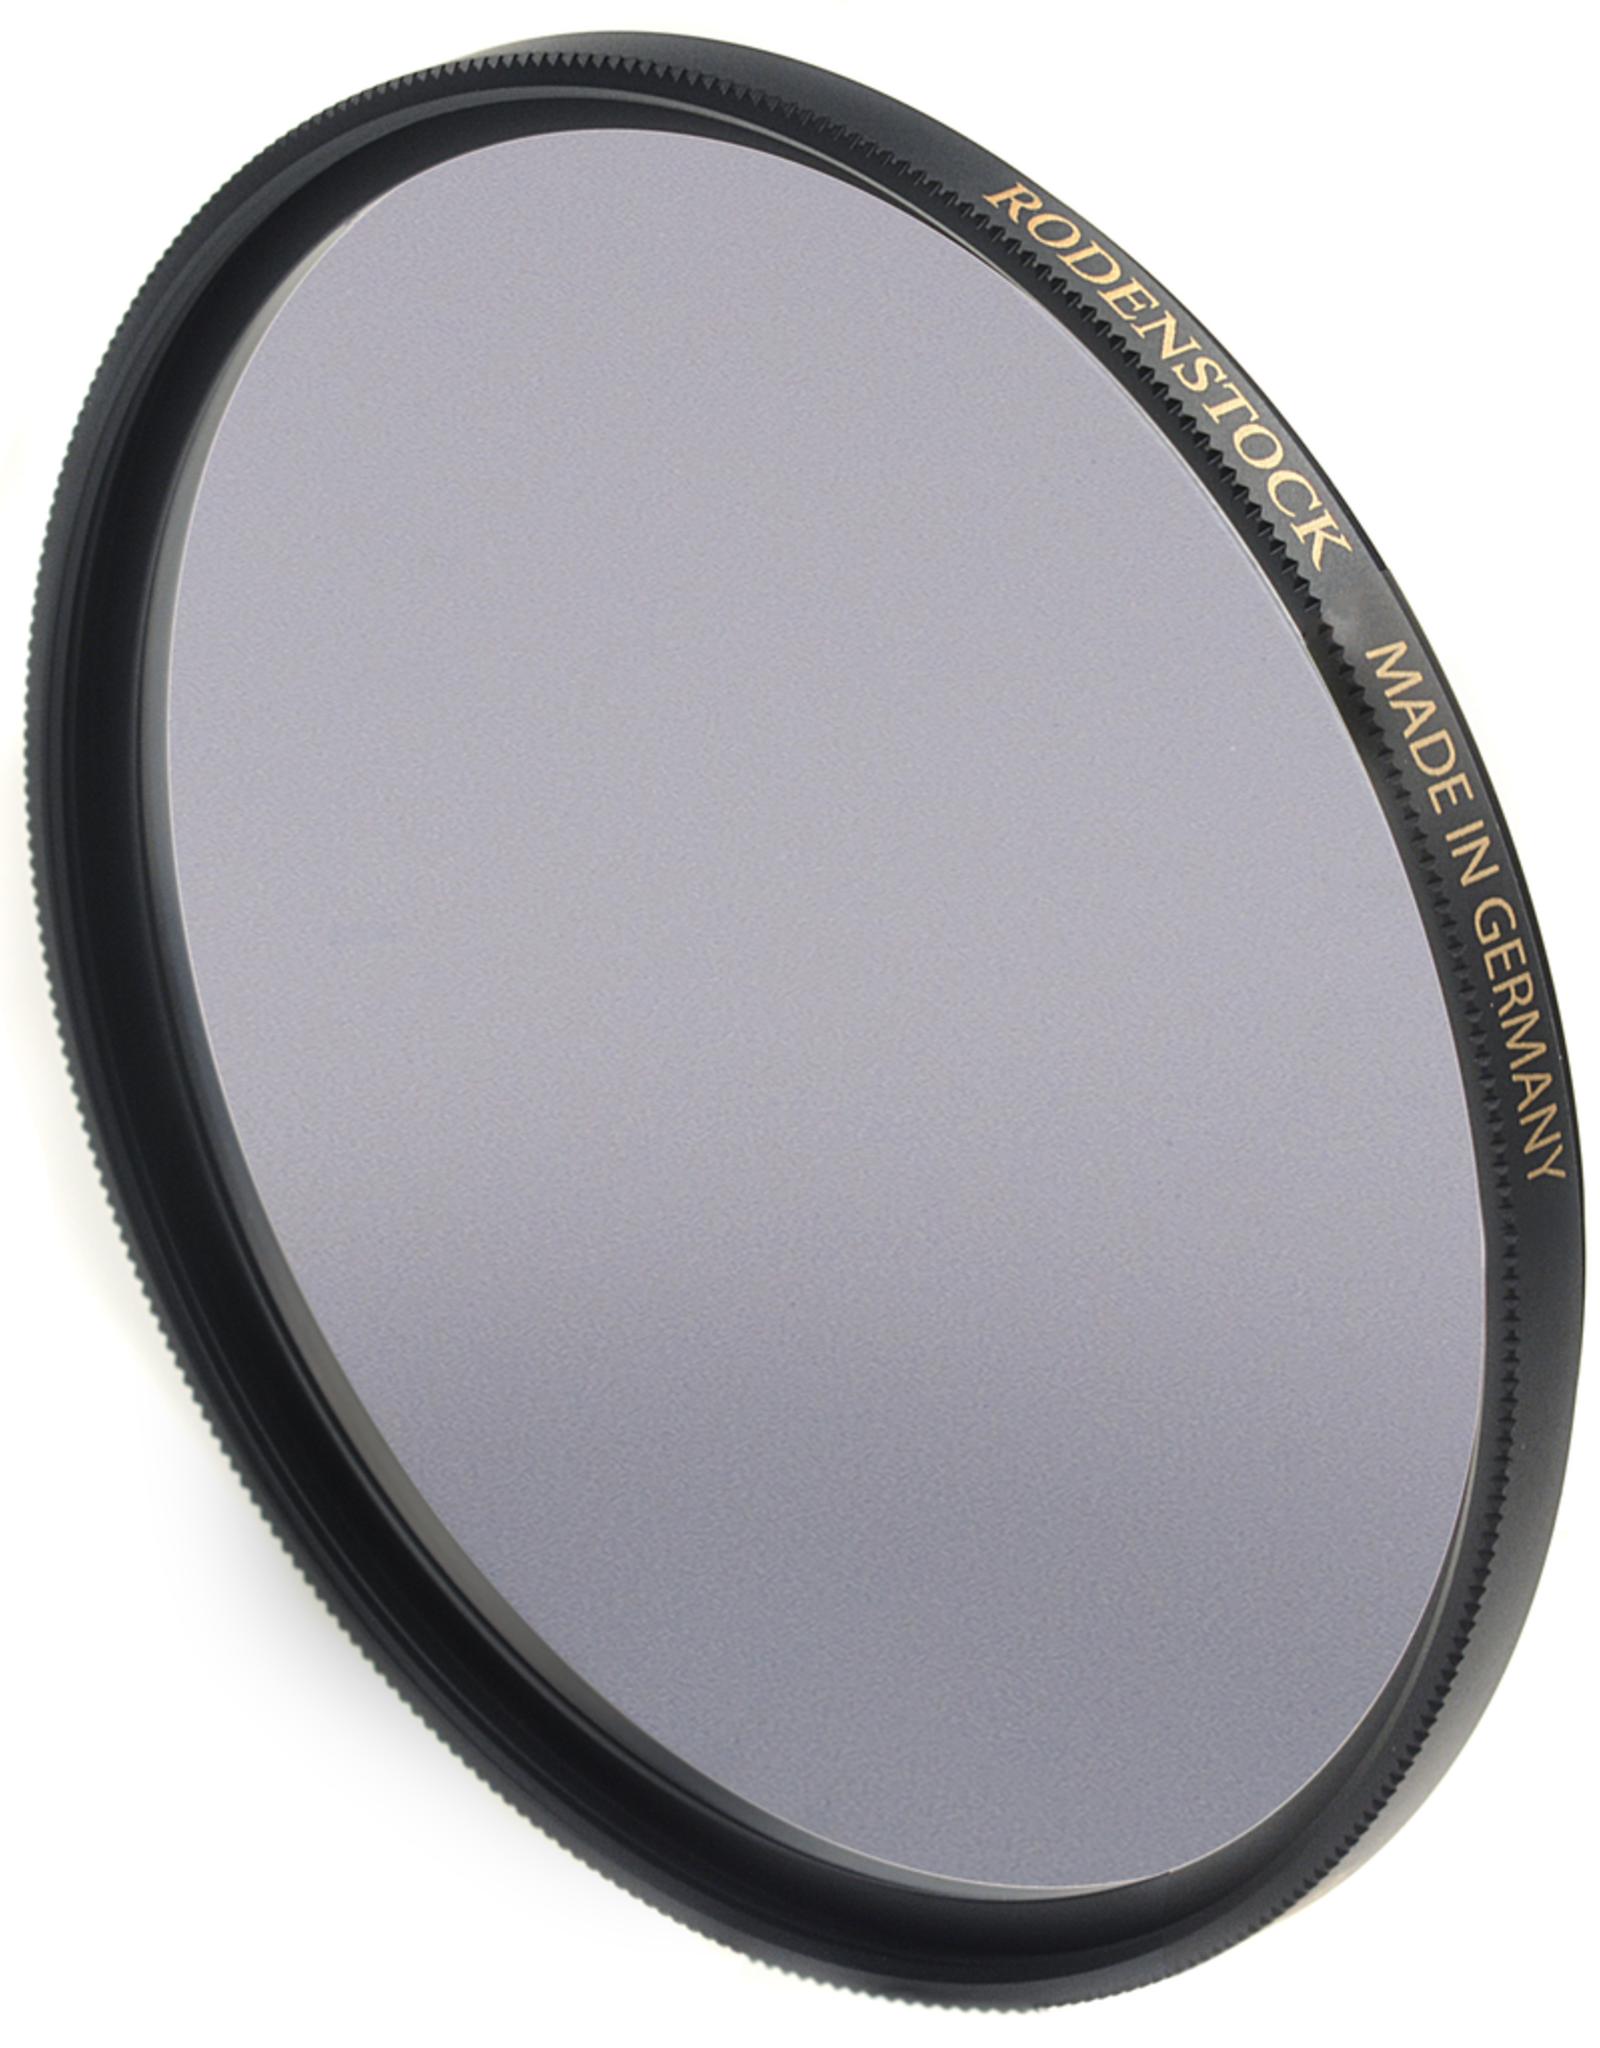 Rodenstock Rodenstock Polarizer HR Digital super MC, circular, Made in Germany,  95 mm